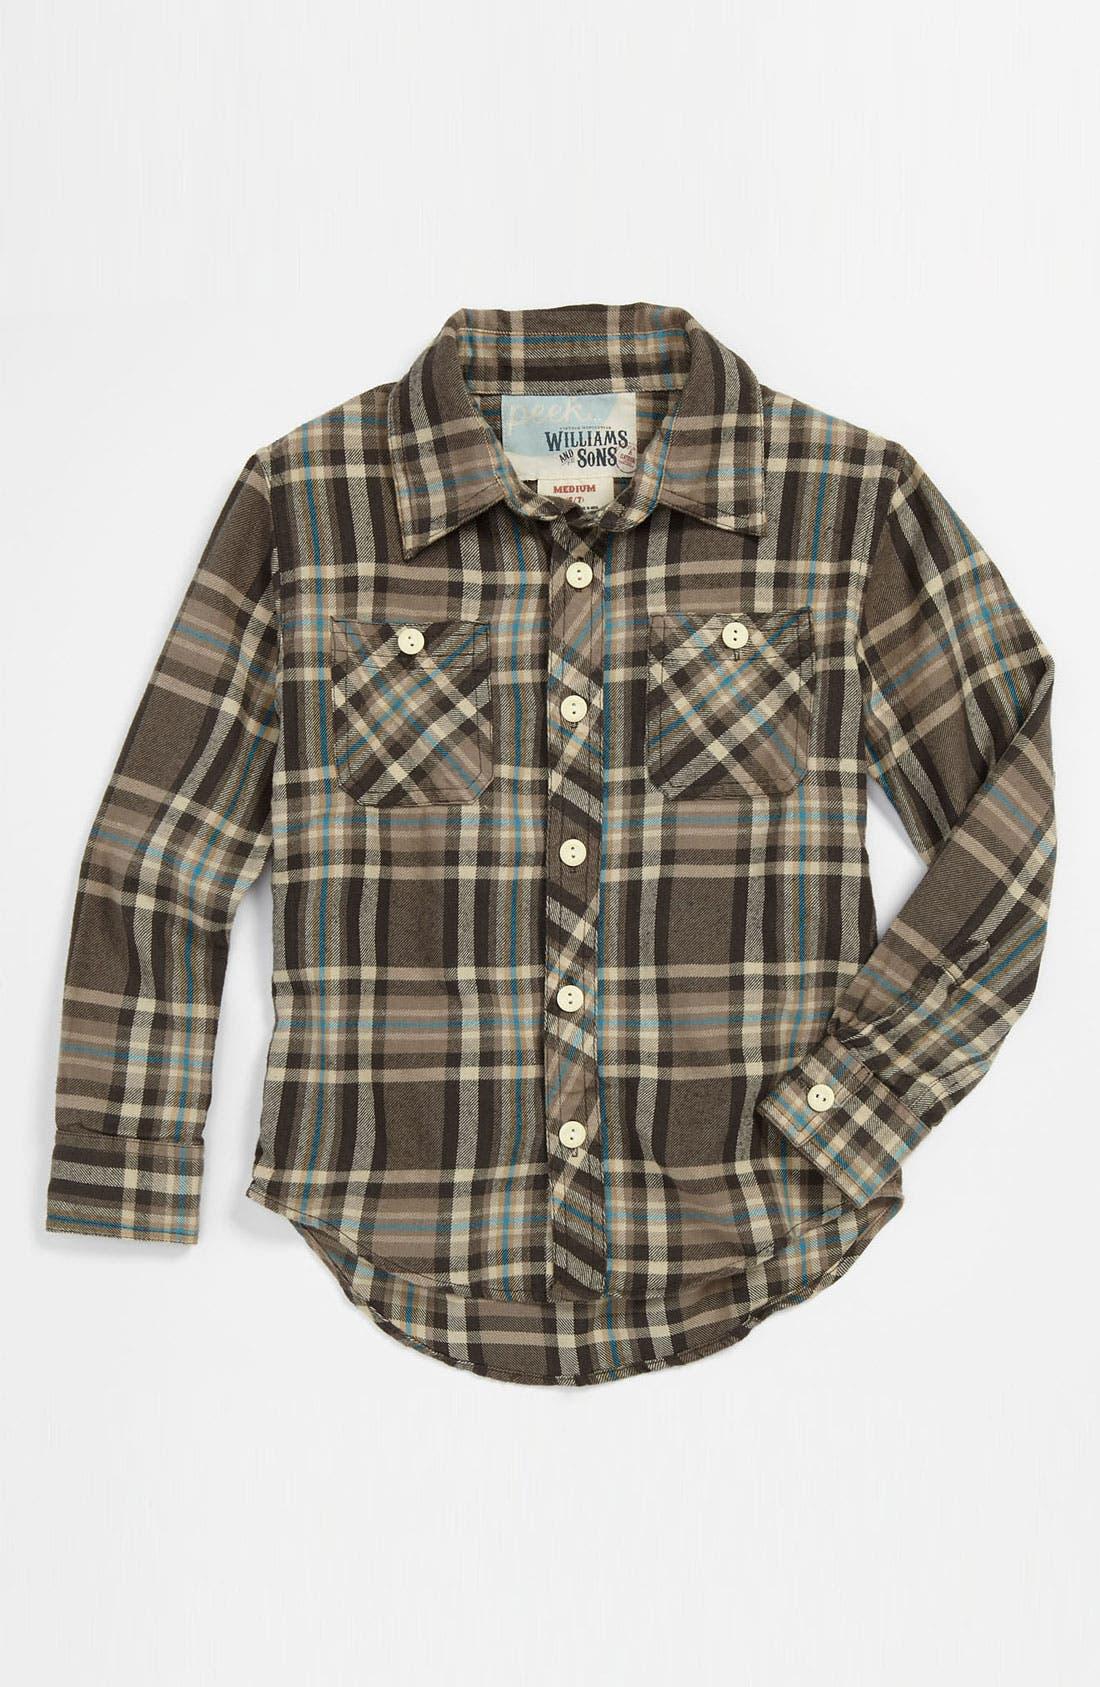 Alternate Image 1 Selected - Peek 'Parkside' Utility Shirt (Toddler, Little Boys & Big Boys)